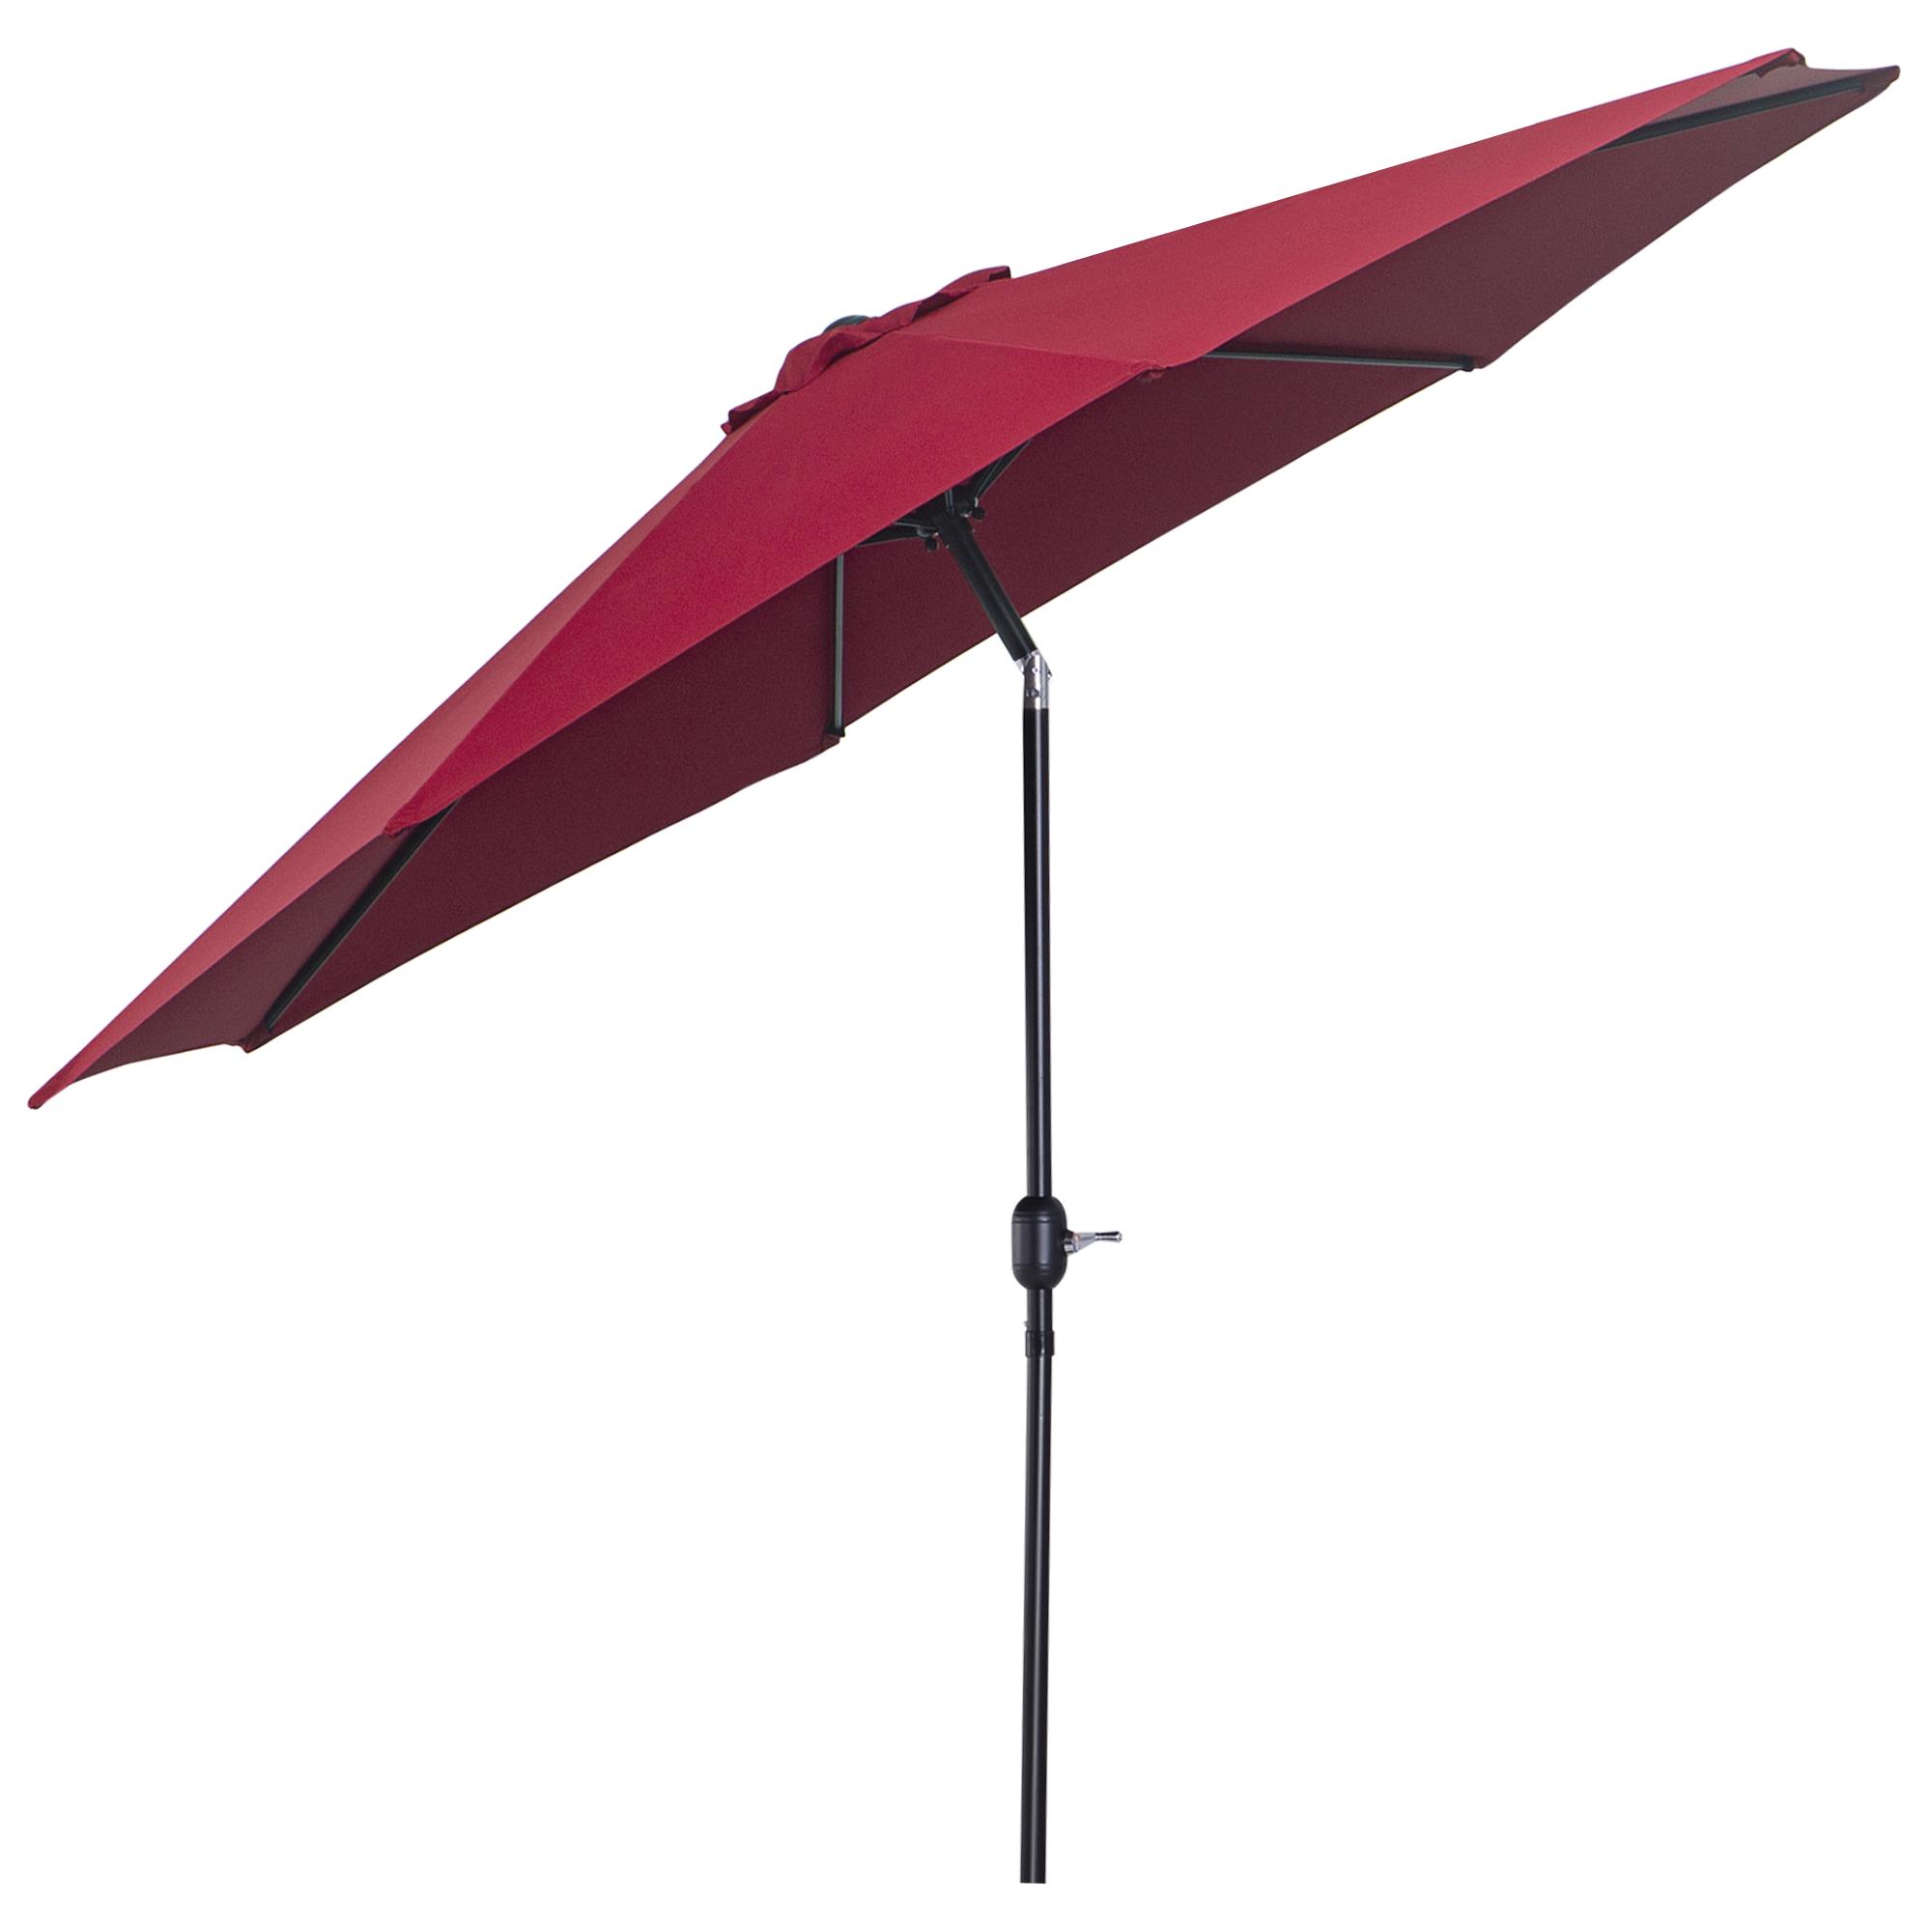 Parasol en aluminium rond inclinable bordeaux